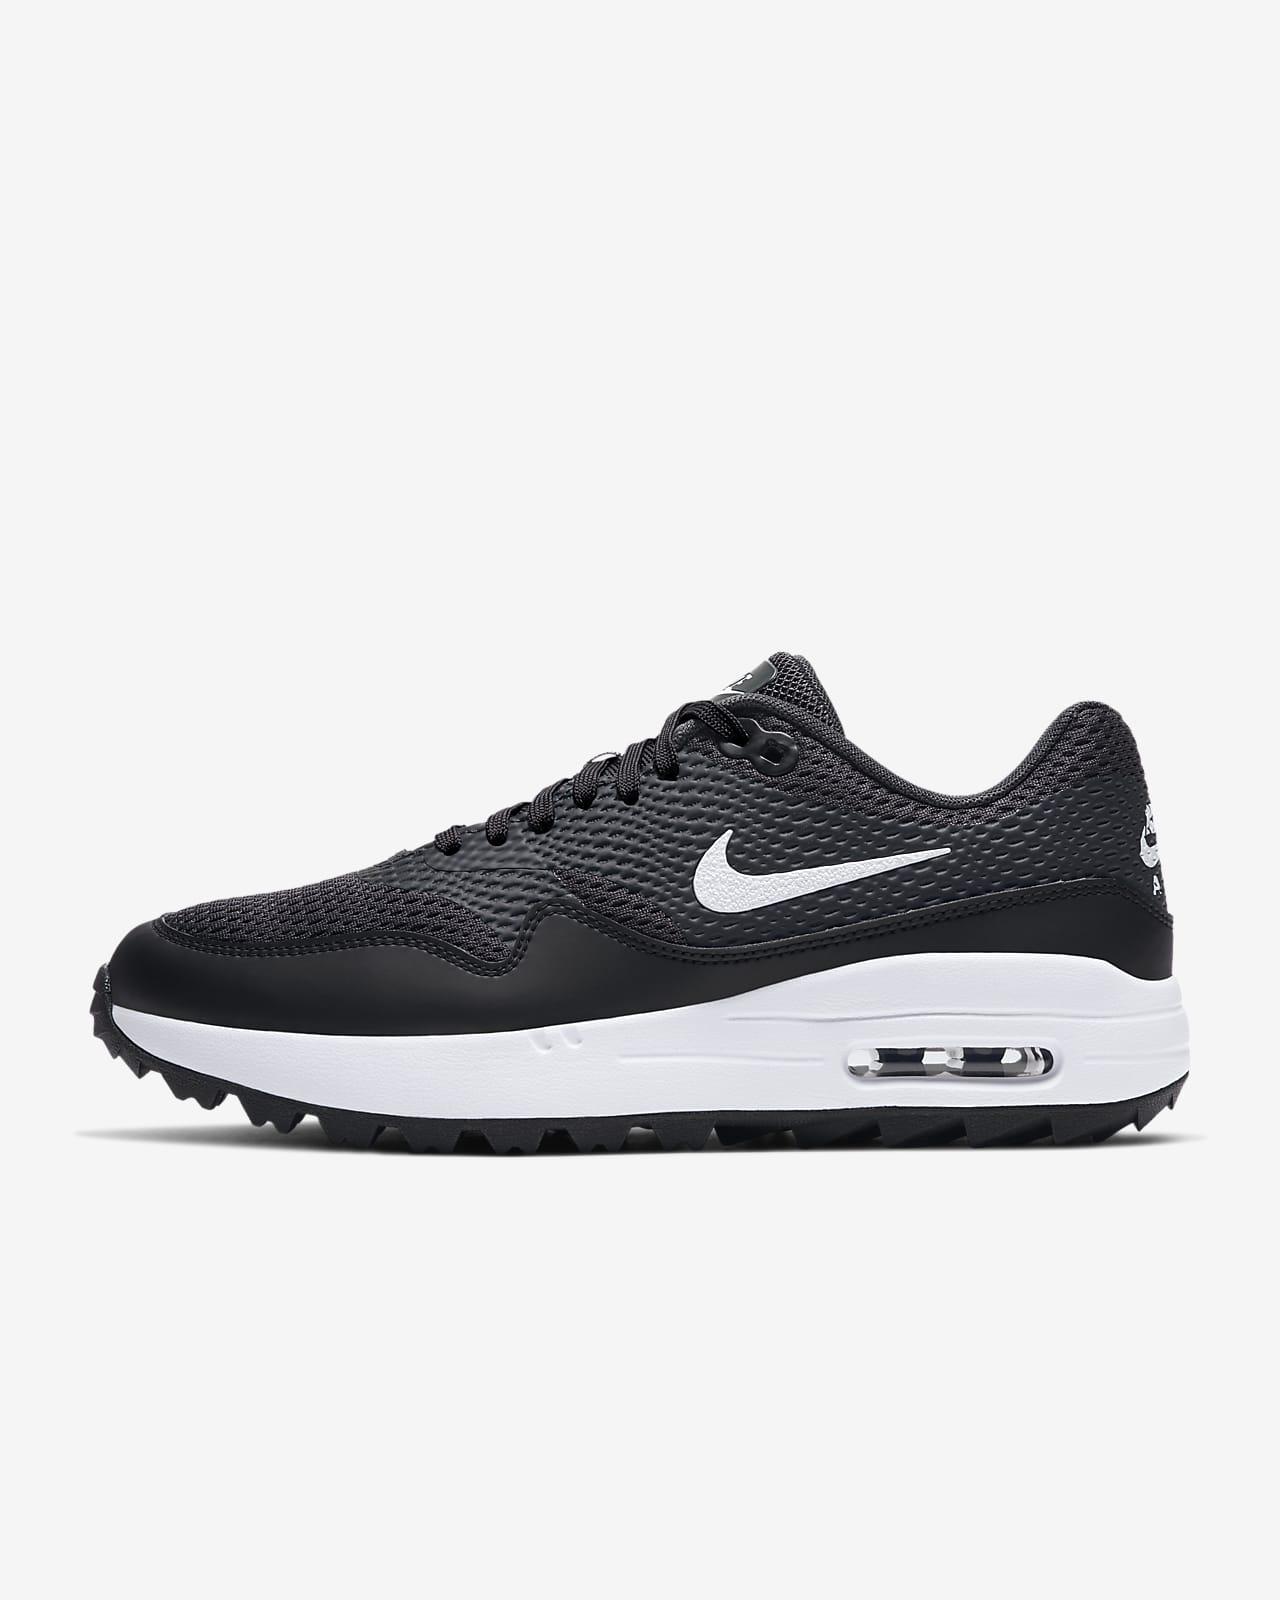 Nike Air Max 1 G Women's Golf Shoe. Nike DK